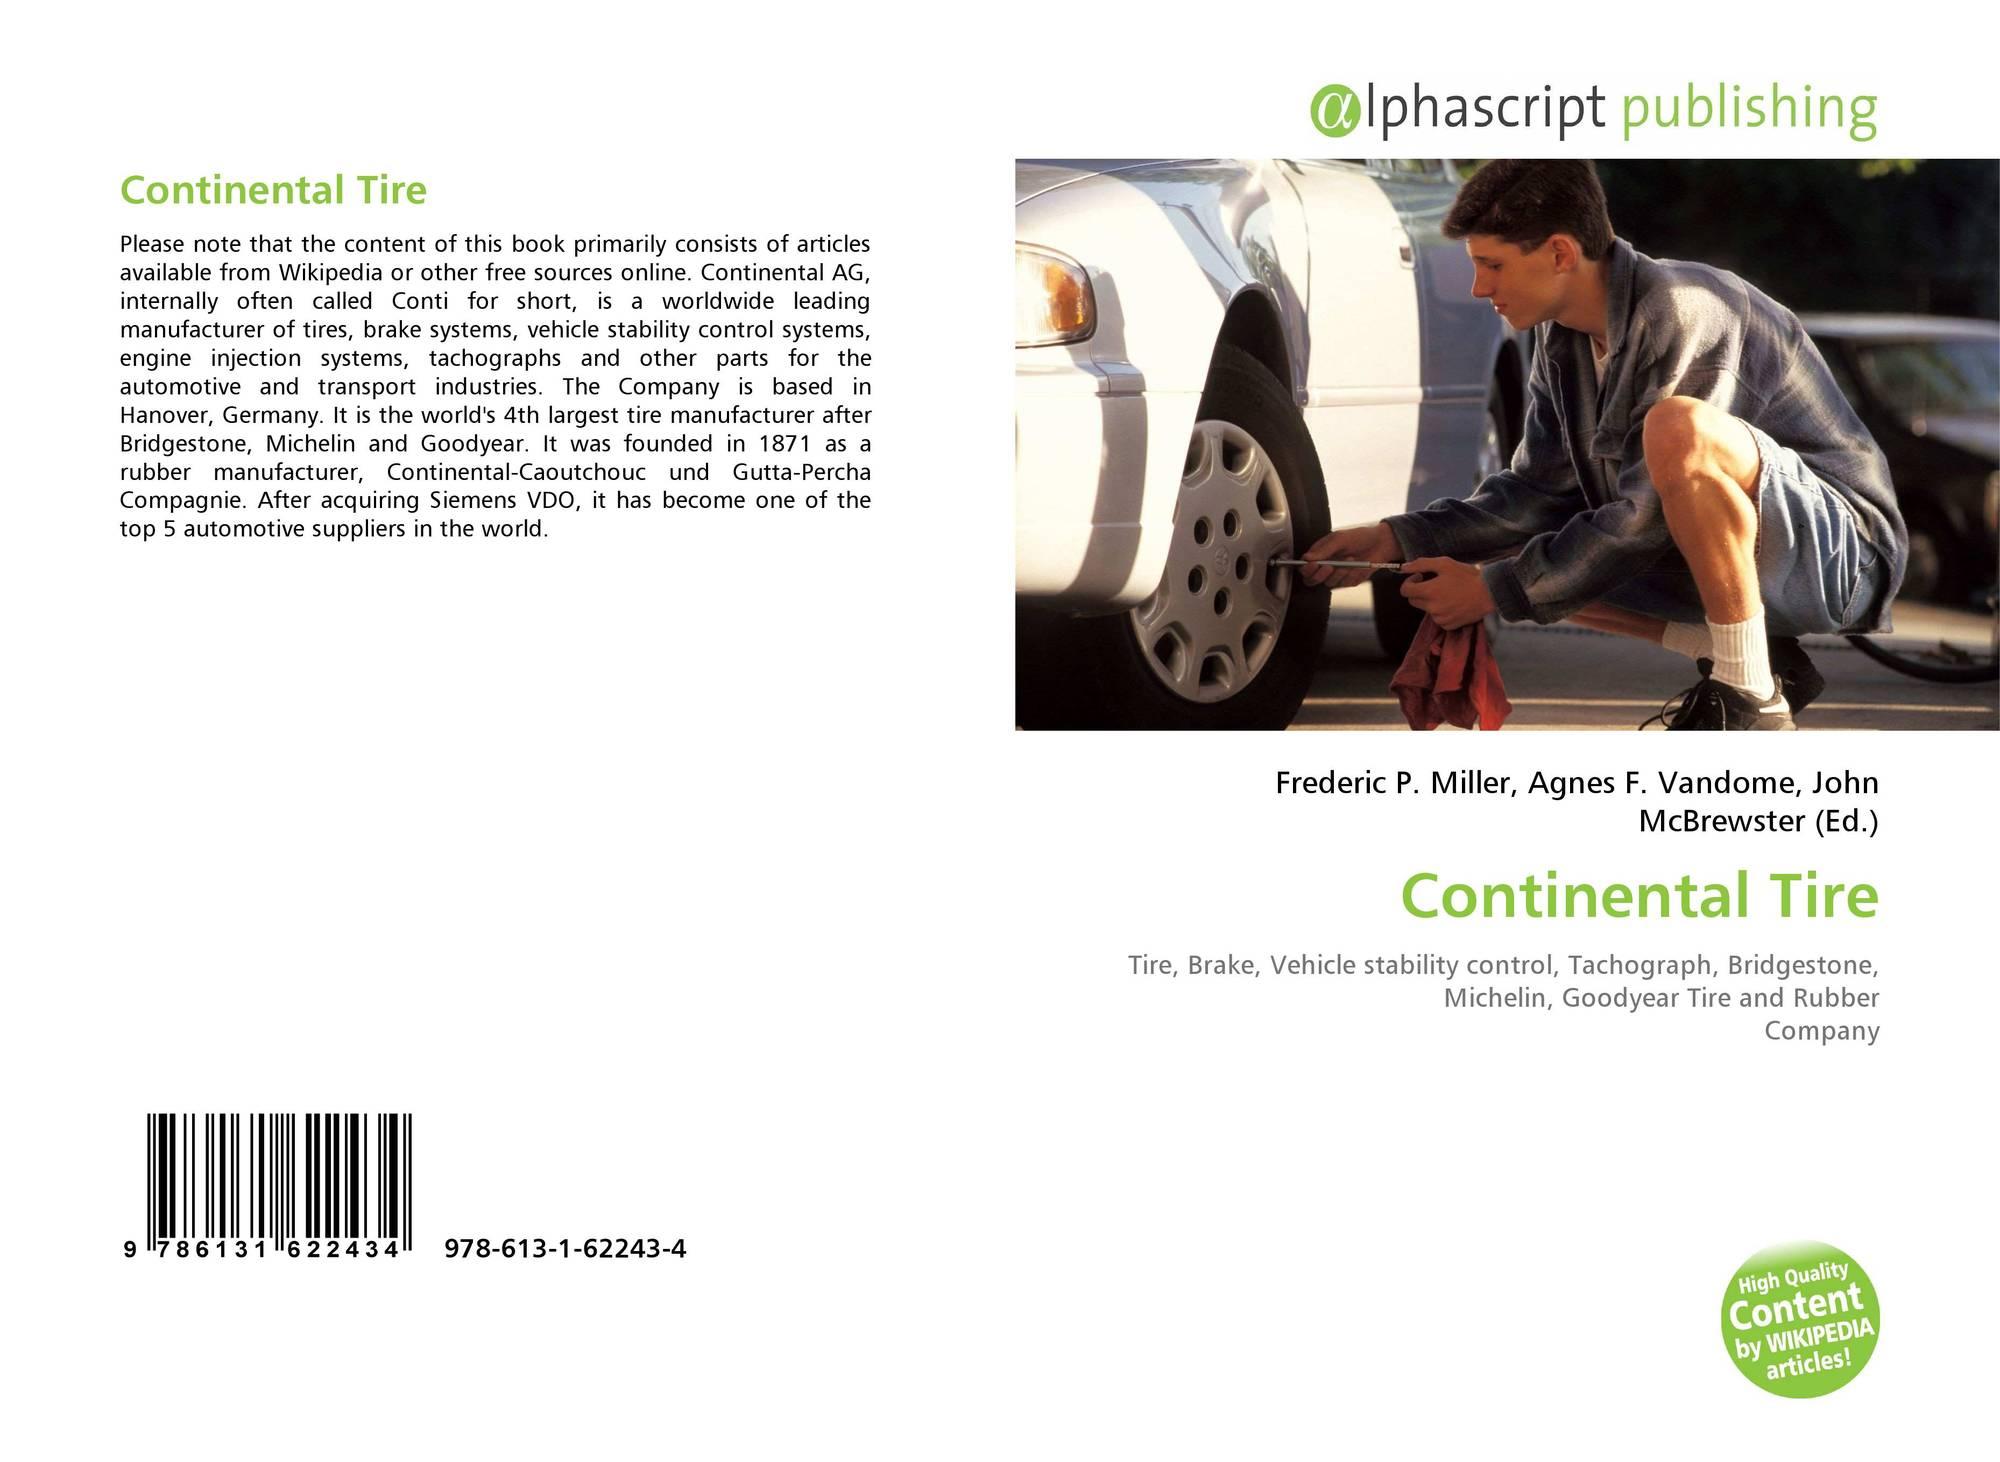 Continental Tire, 978 613 1 62243 4, 6131622434 ,9786131622434